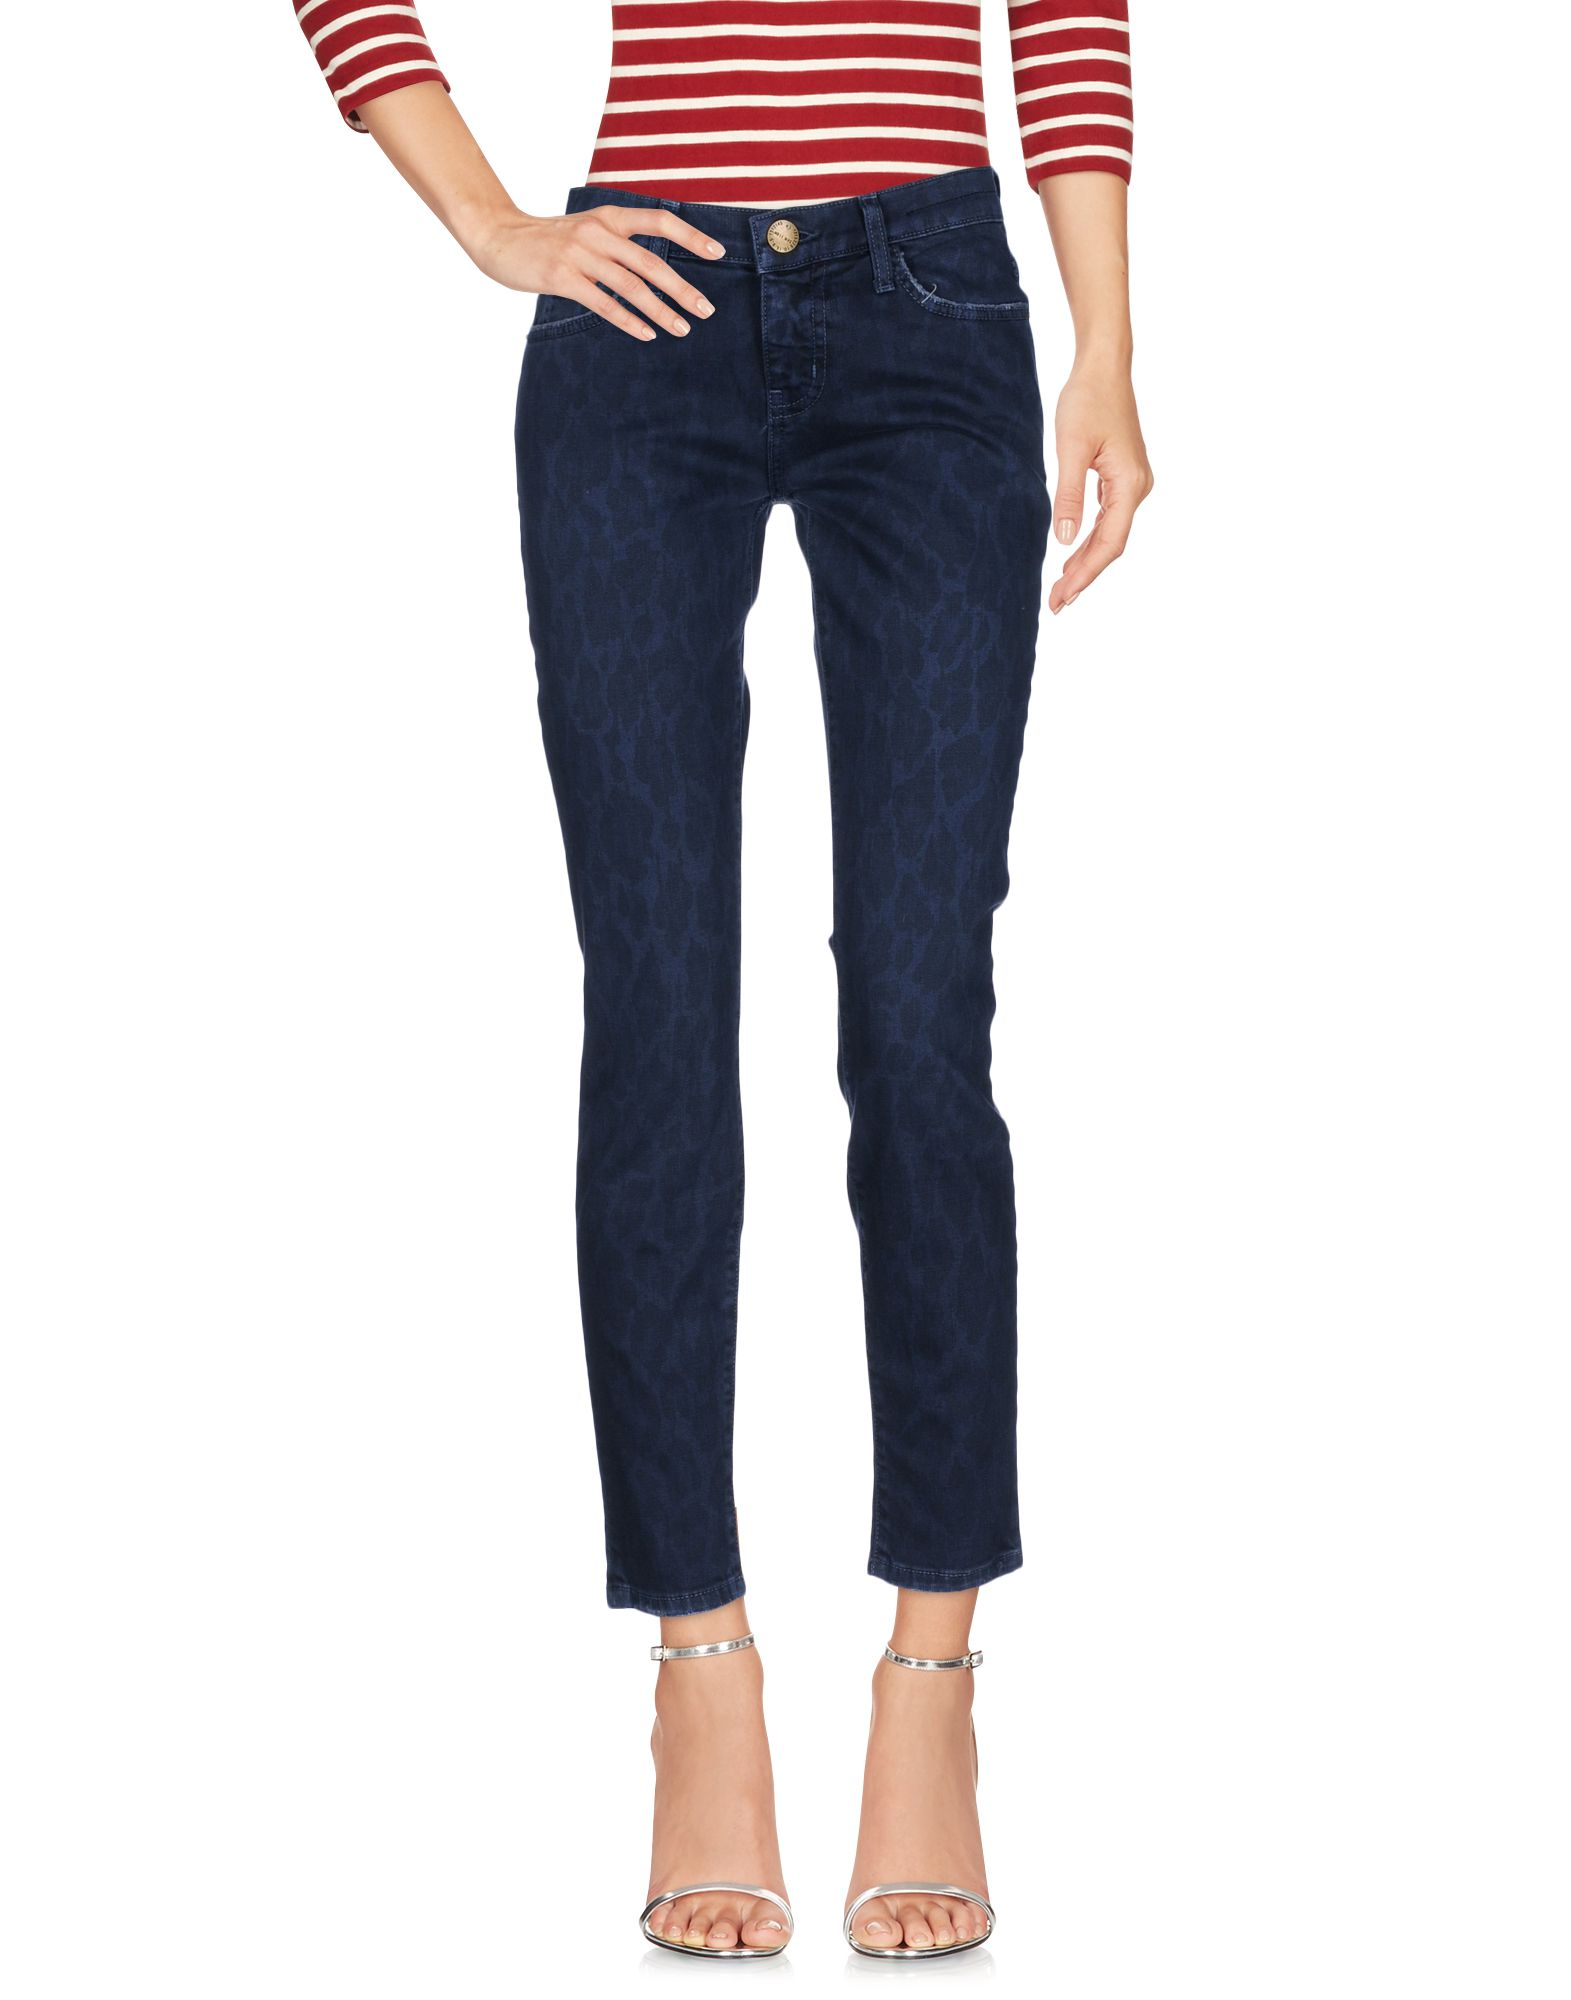 CURRENT/ELLIOTT Damen Jeanshose Farbe Taubenblau Größe 1